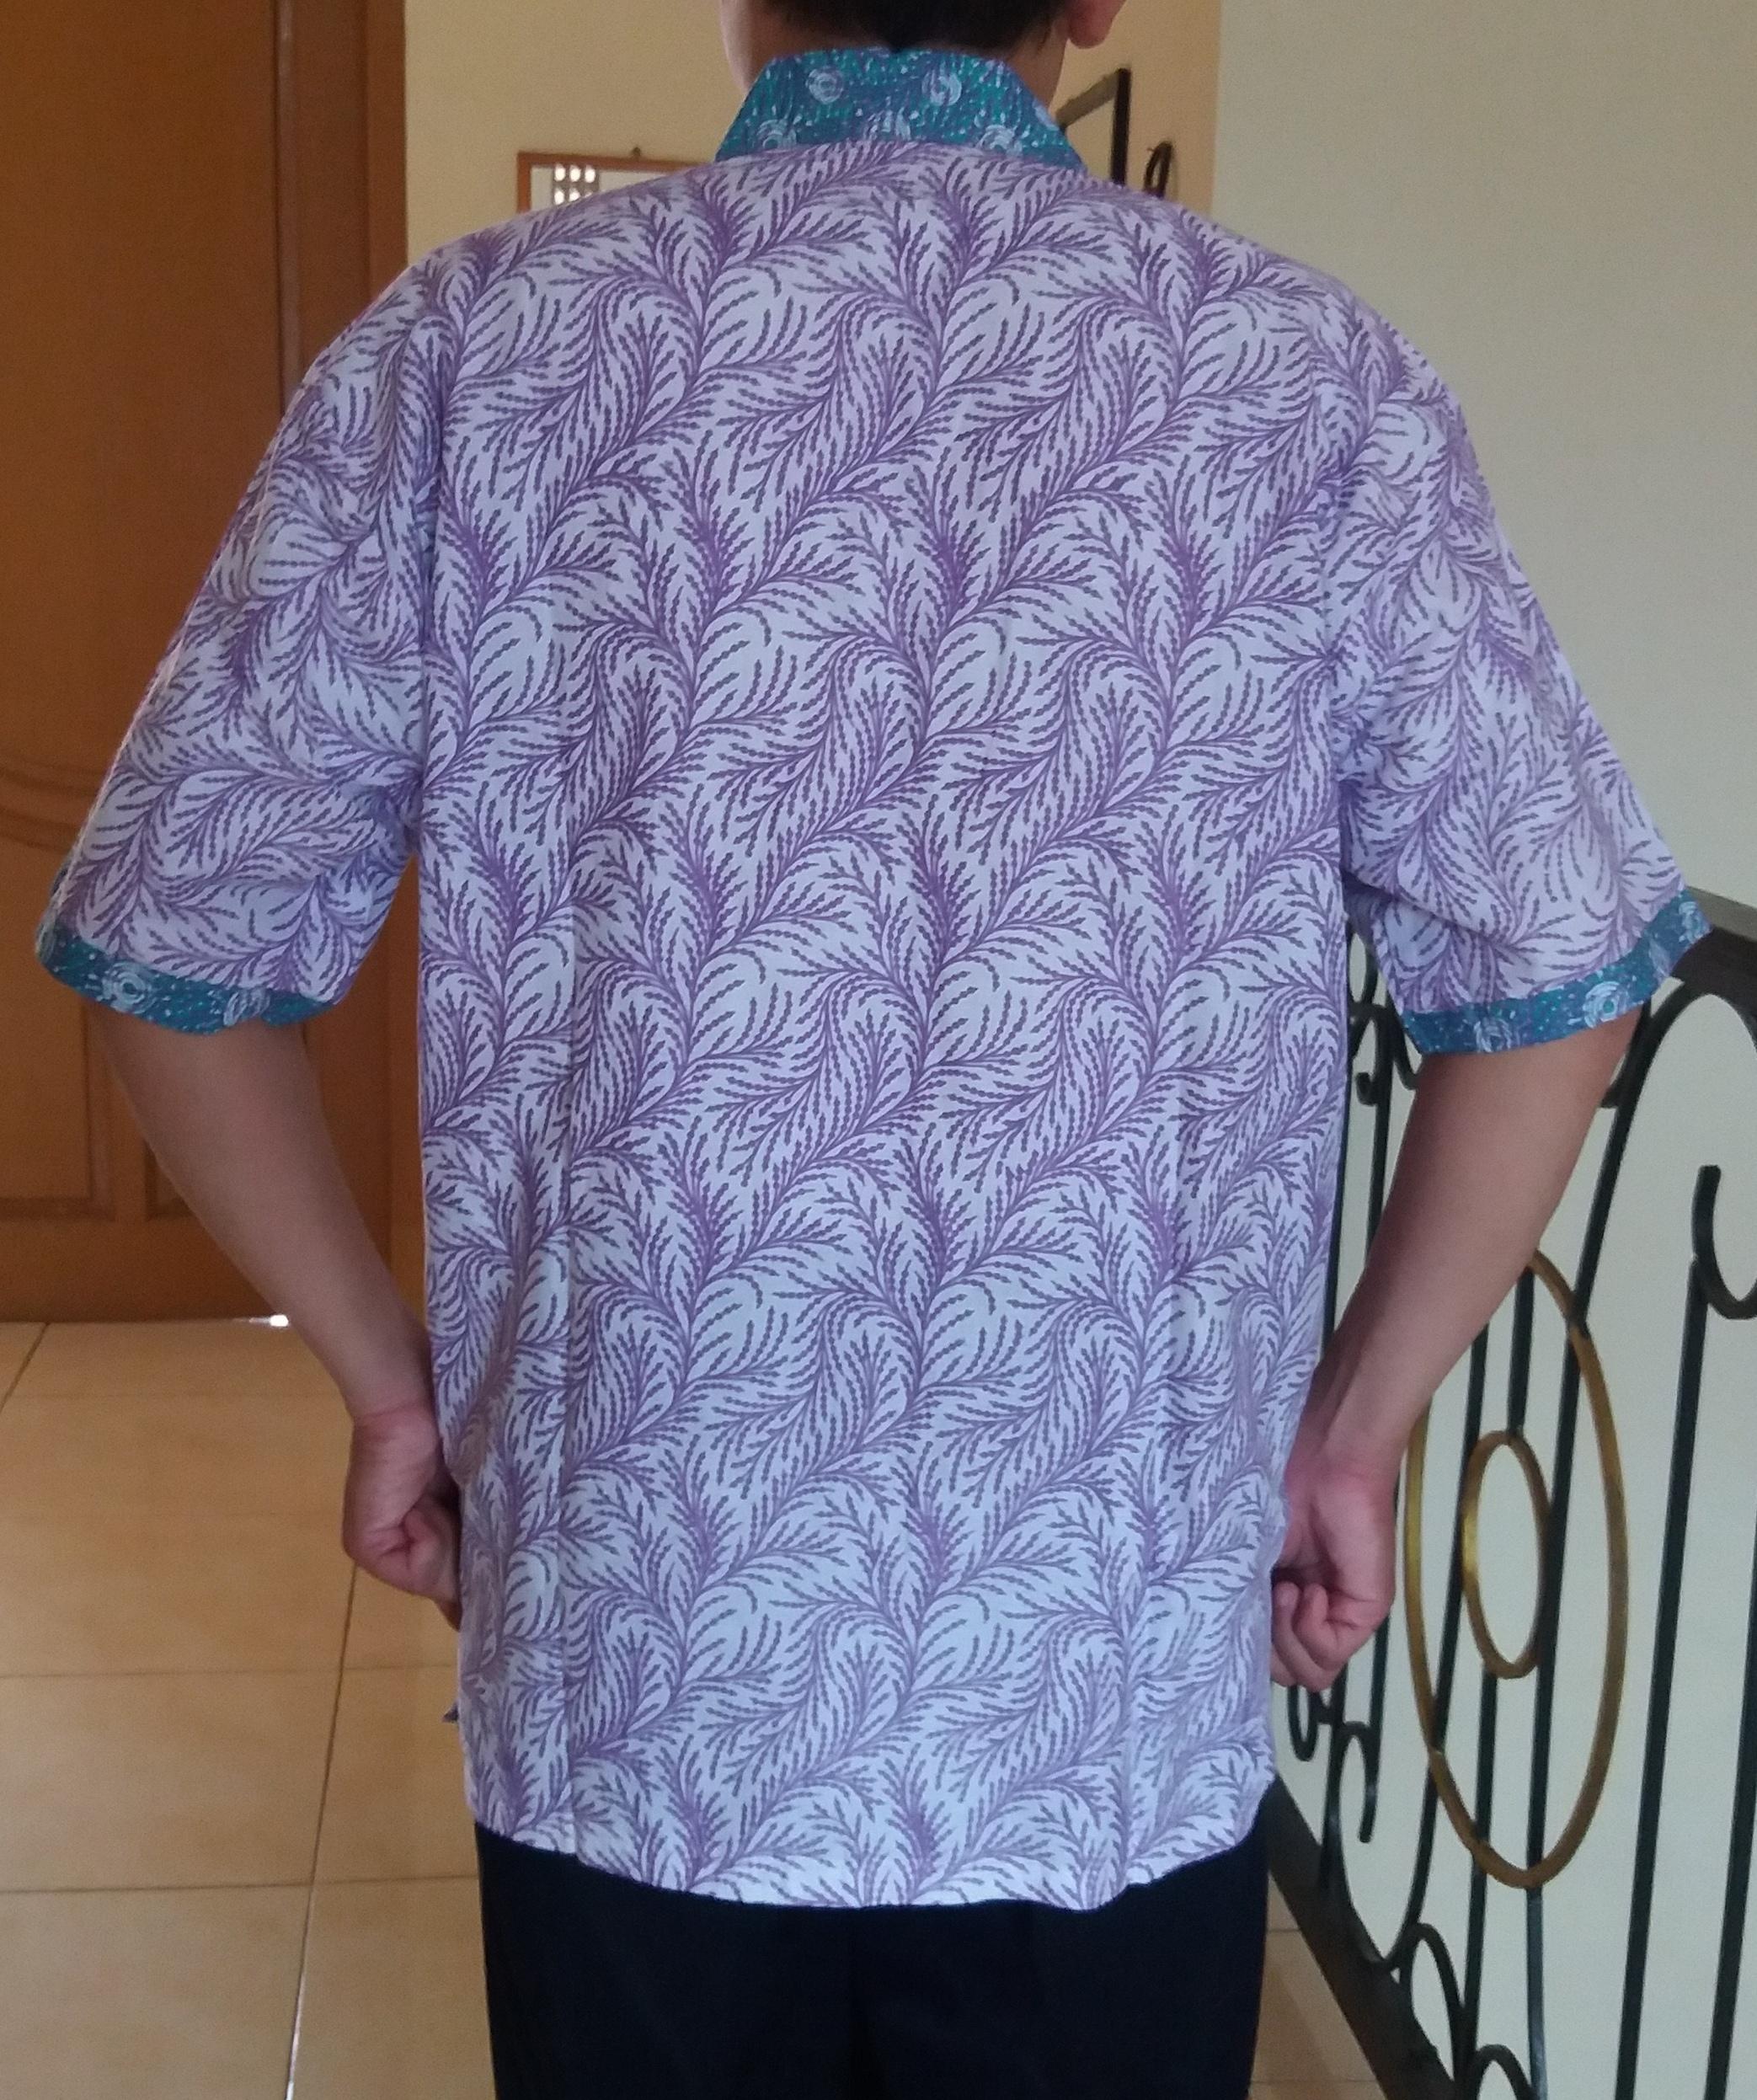 20160305_142324 Batik (LK)